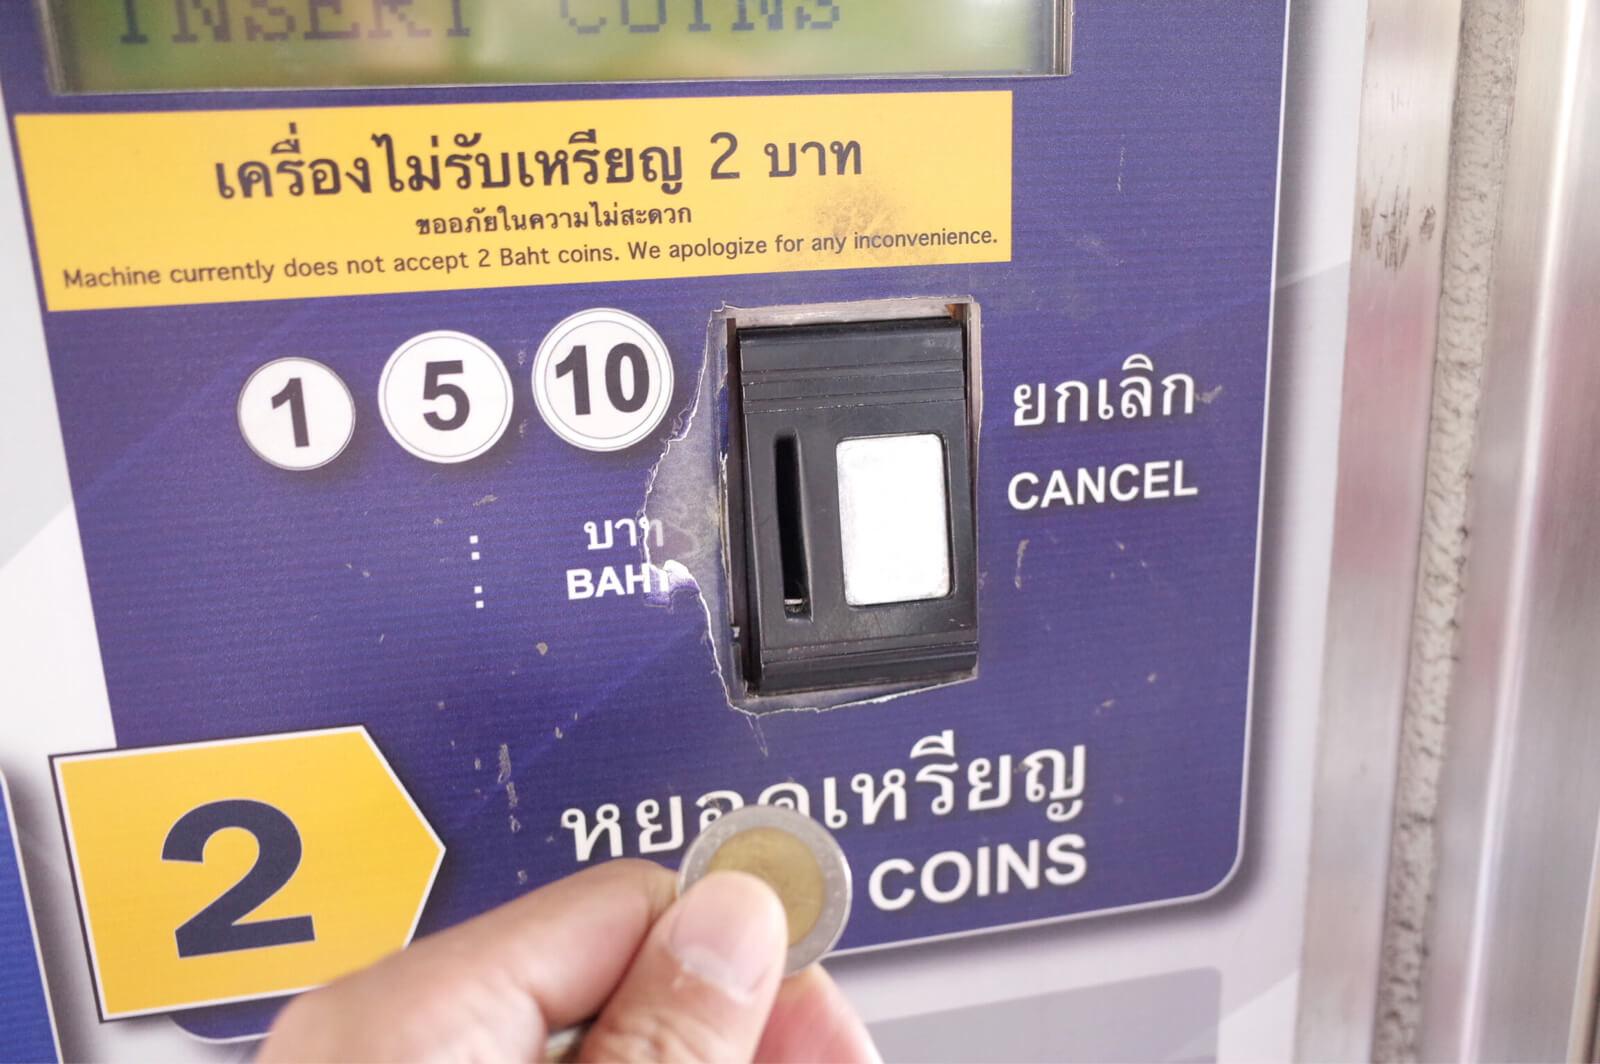 BTS サラデーン駅 券売機